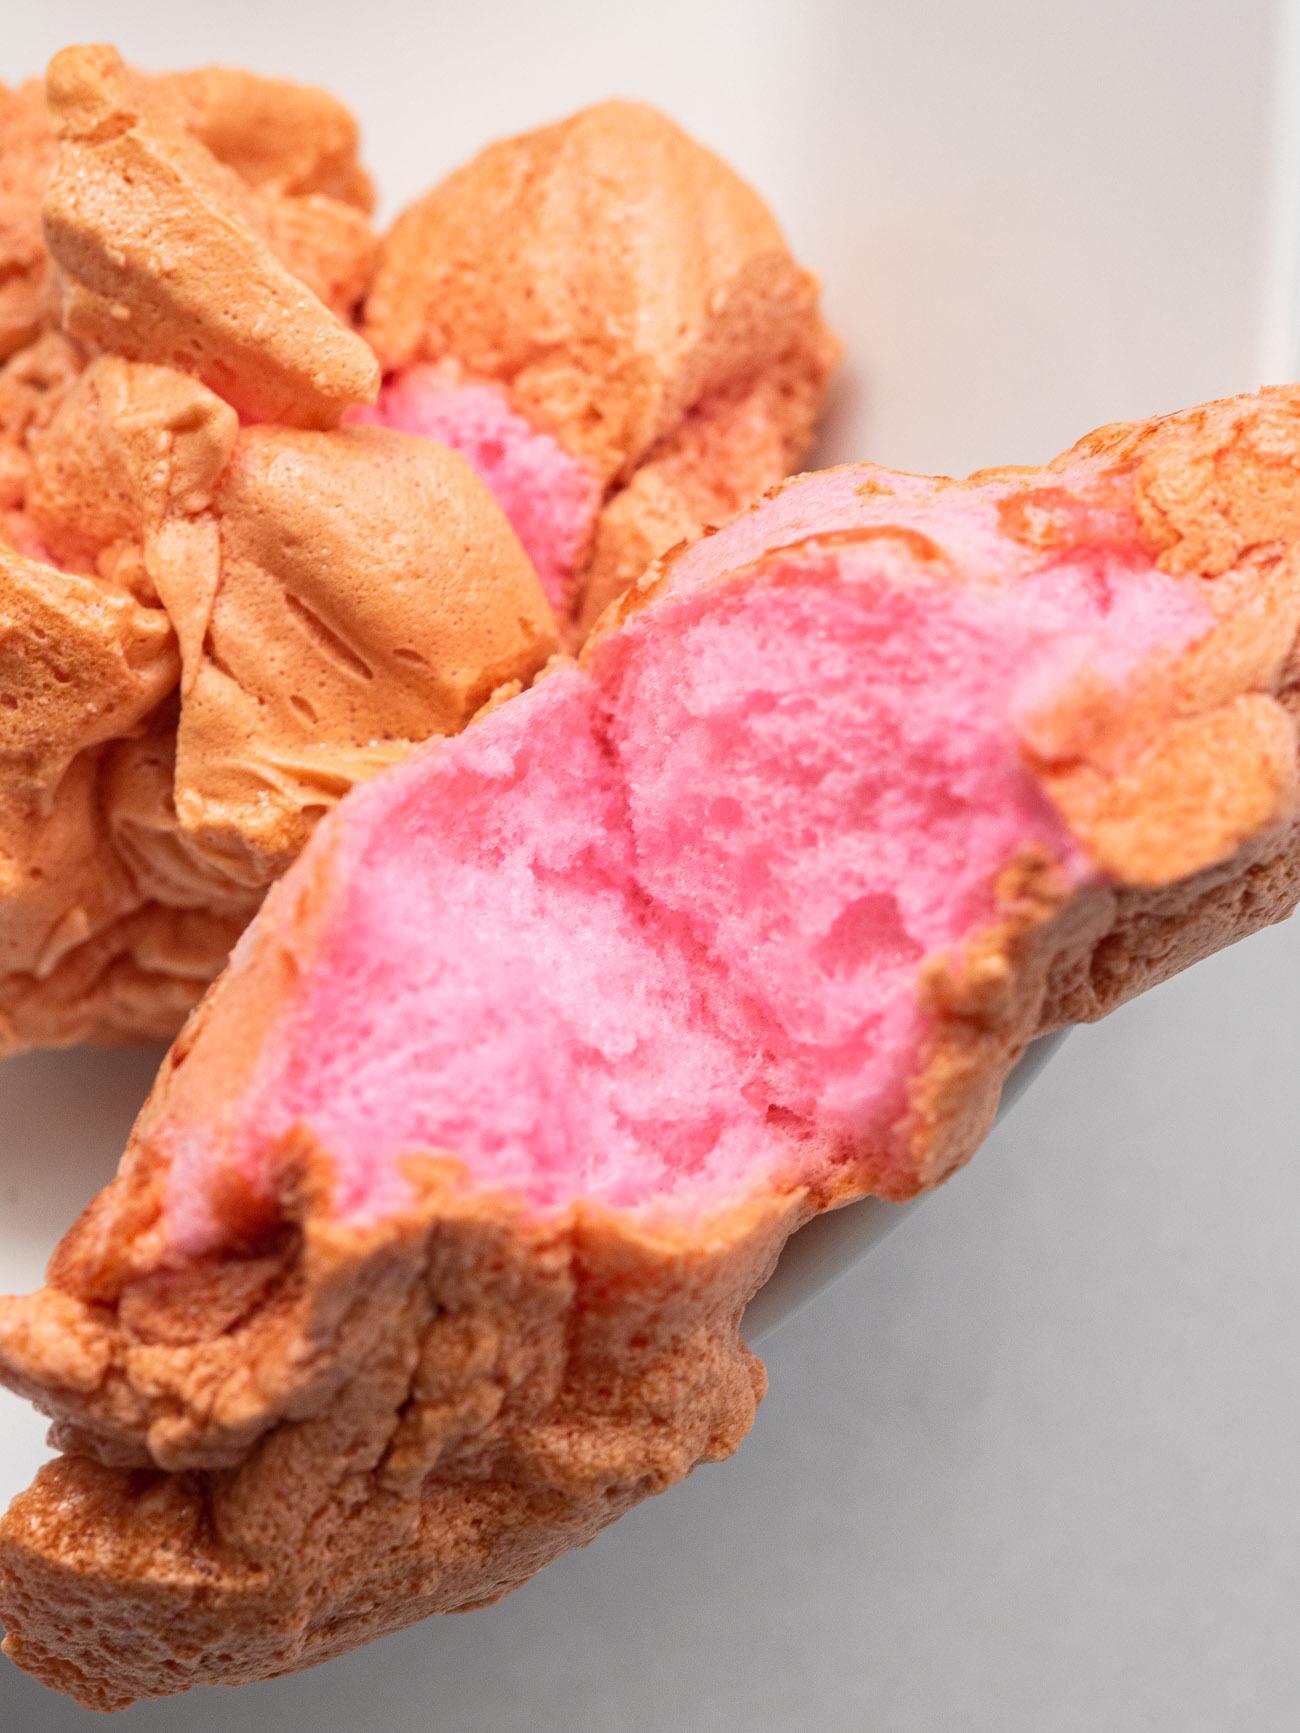 Top down of pink cloud bread